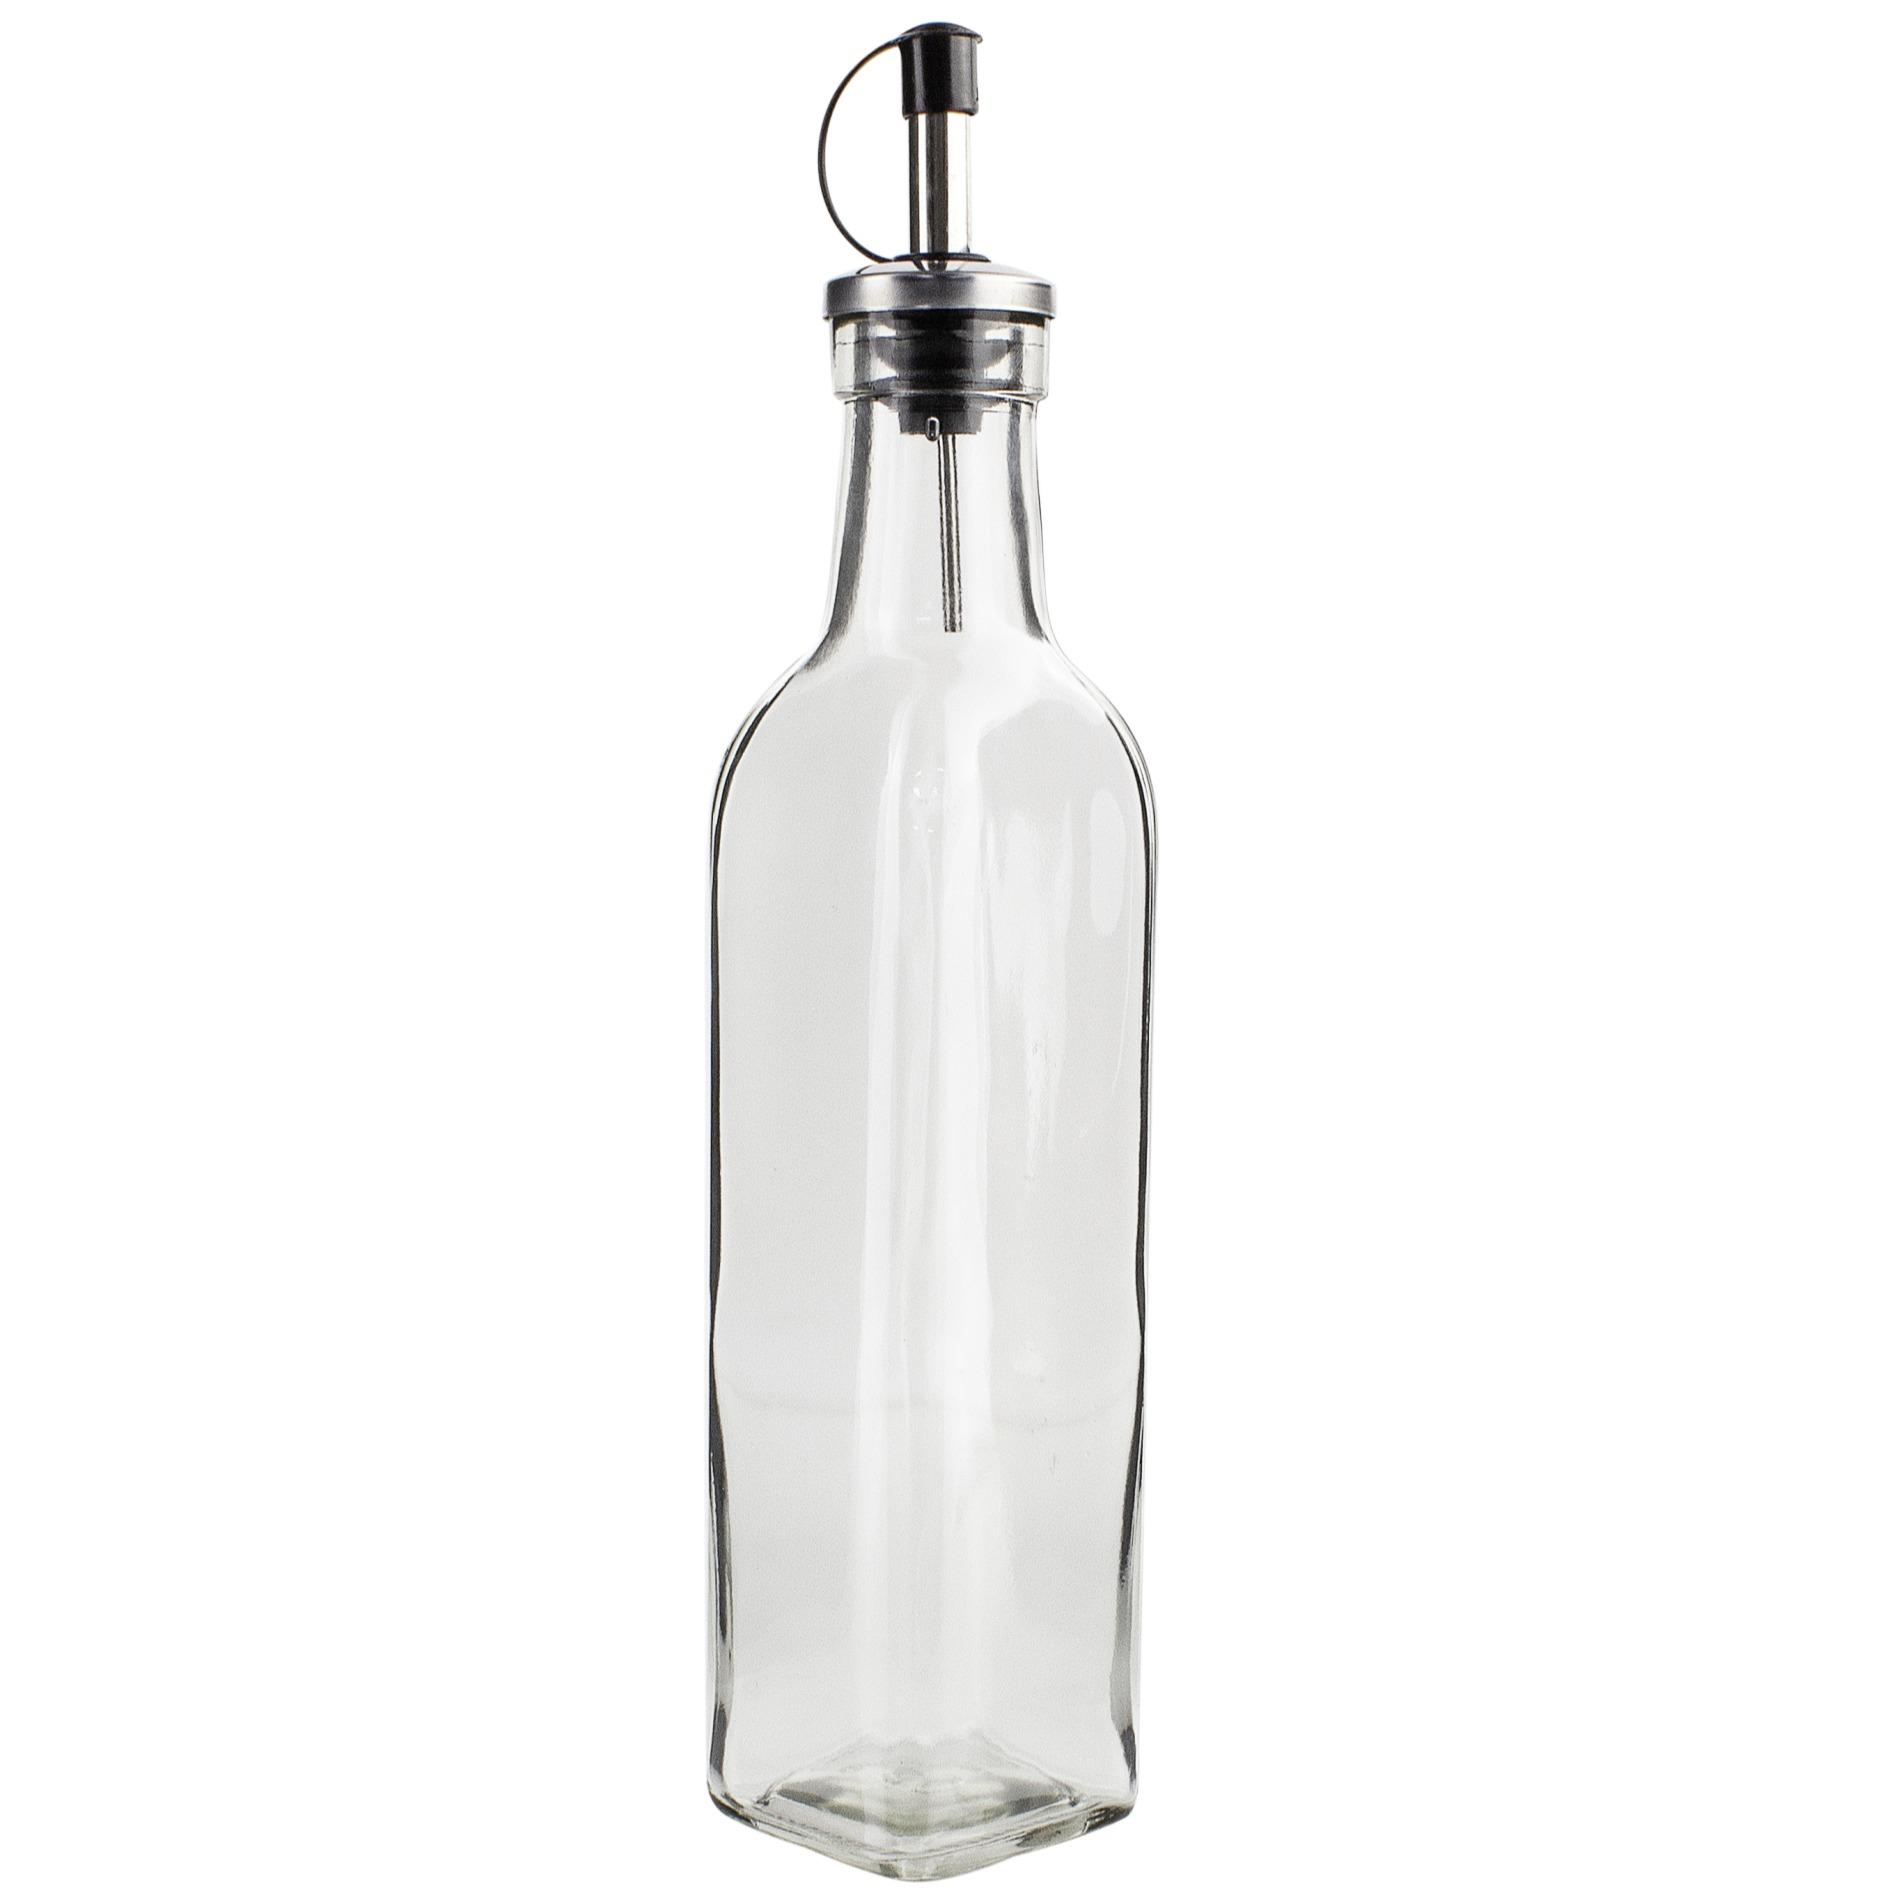 Azeiteiro de Vidro 250 ml - 20500312